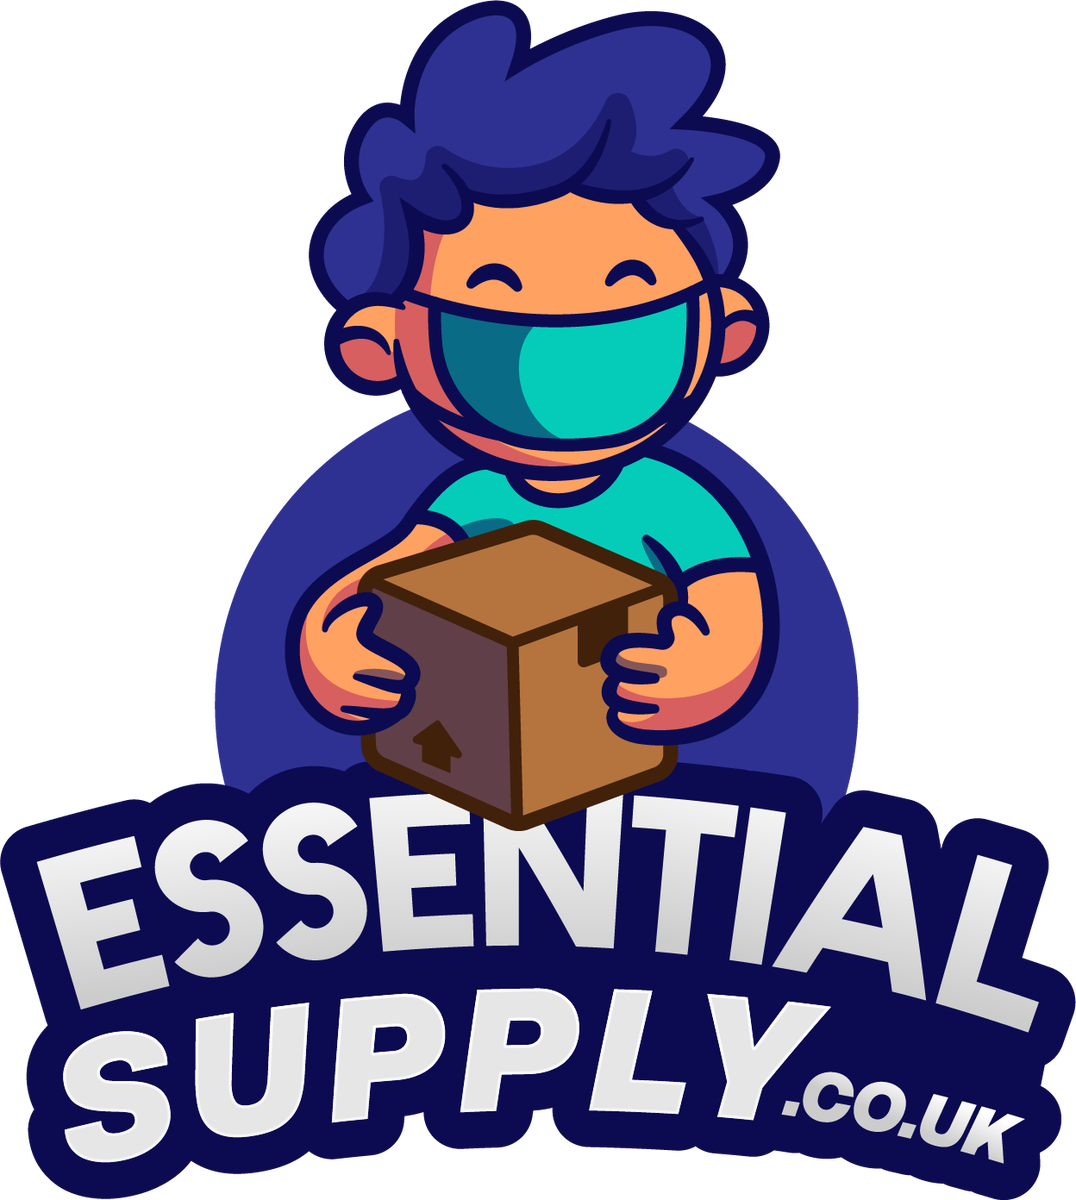 Essential Supply